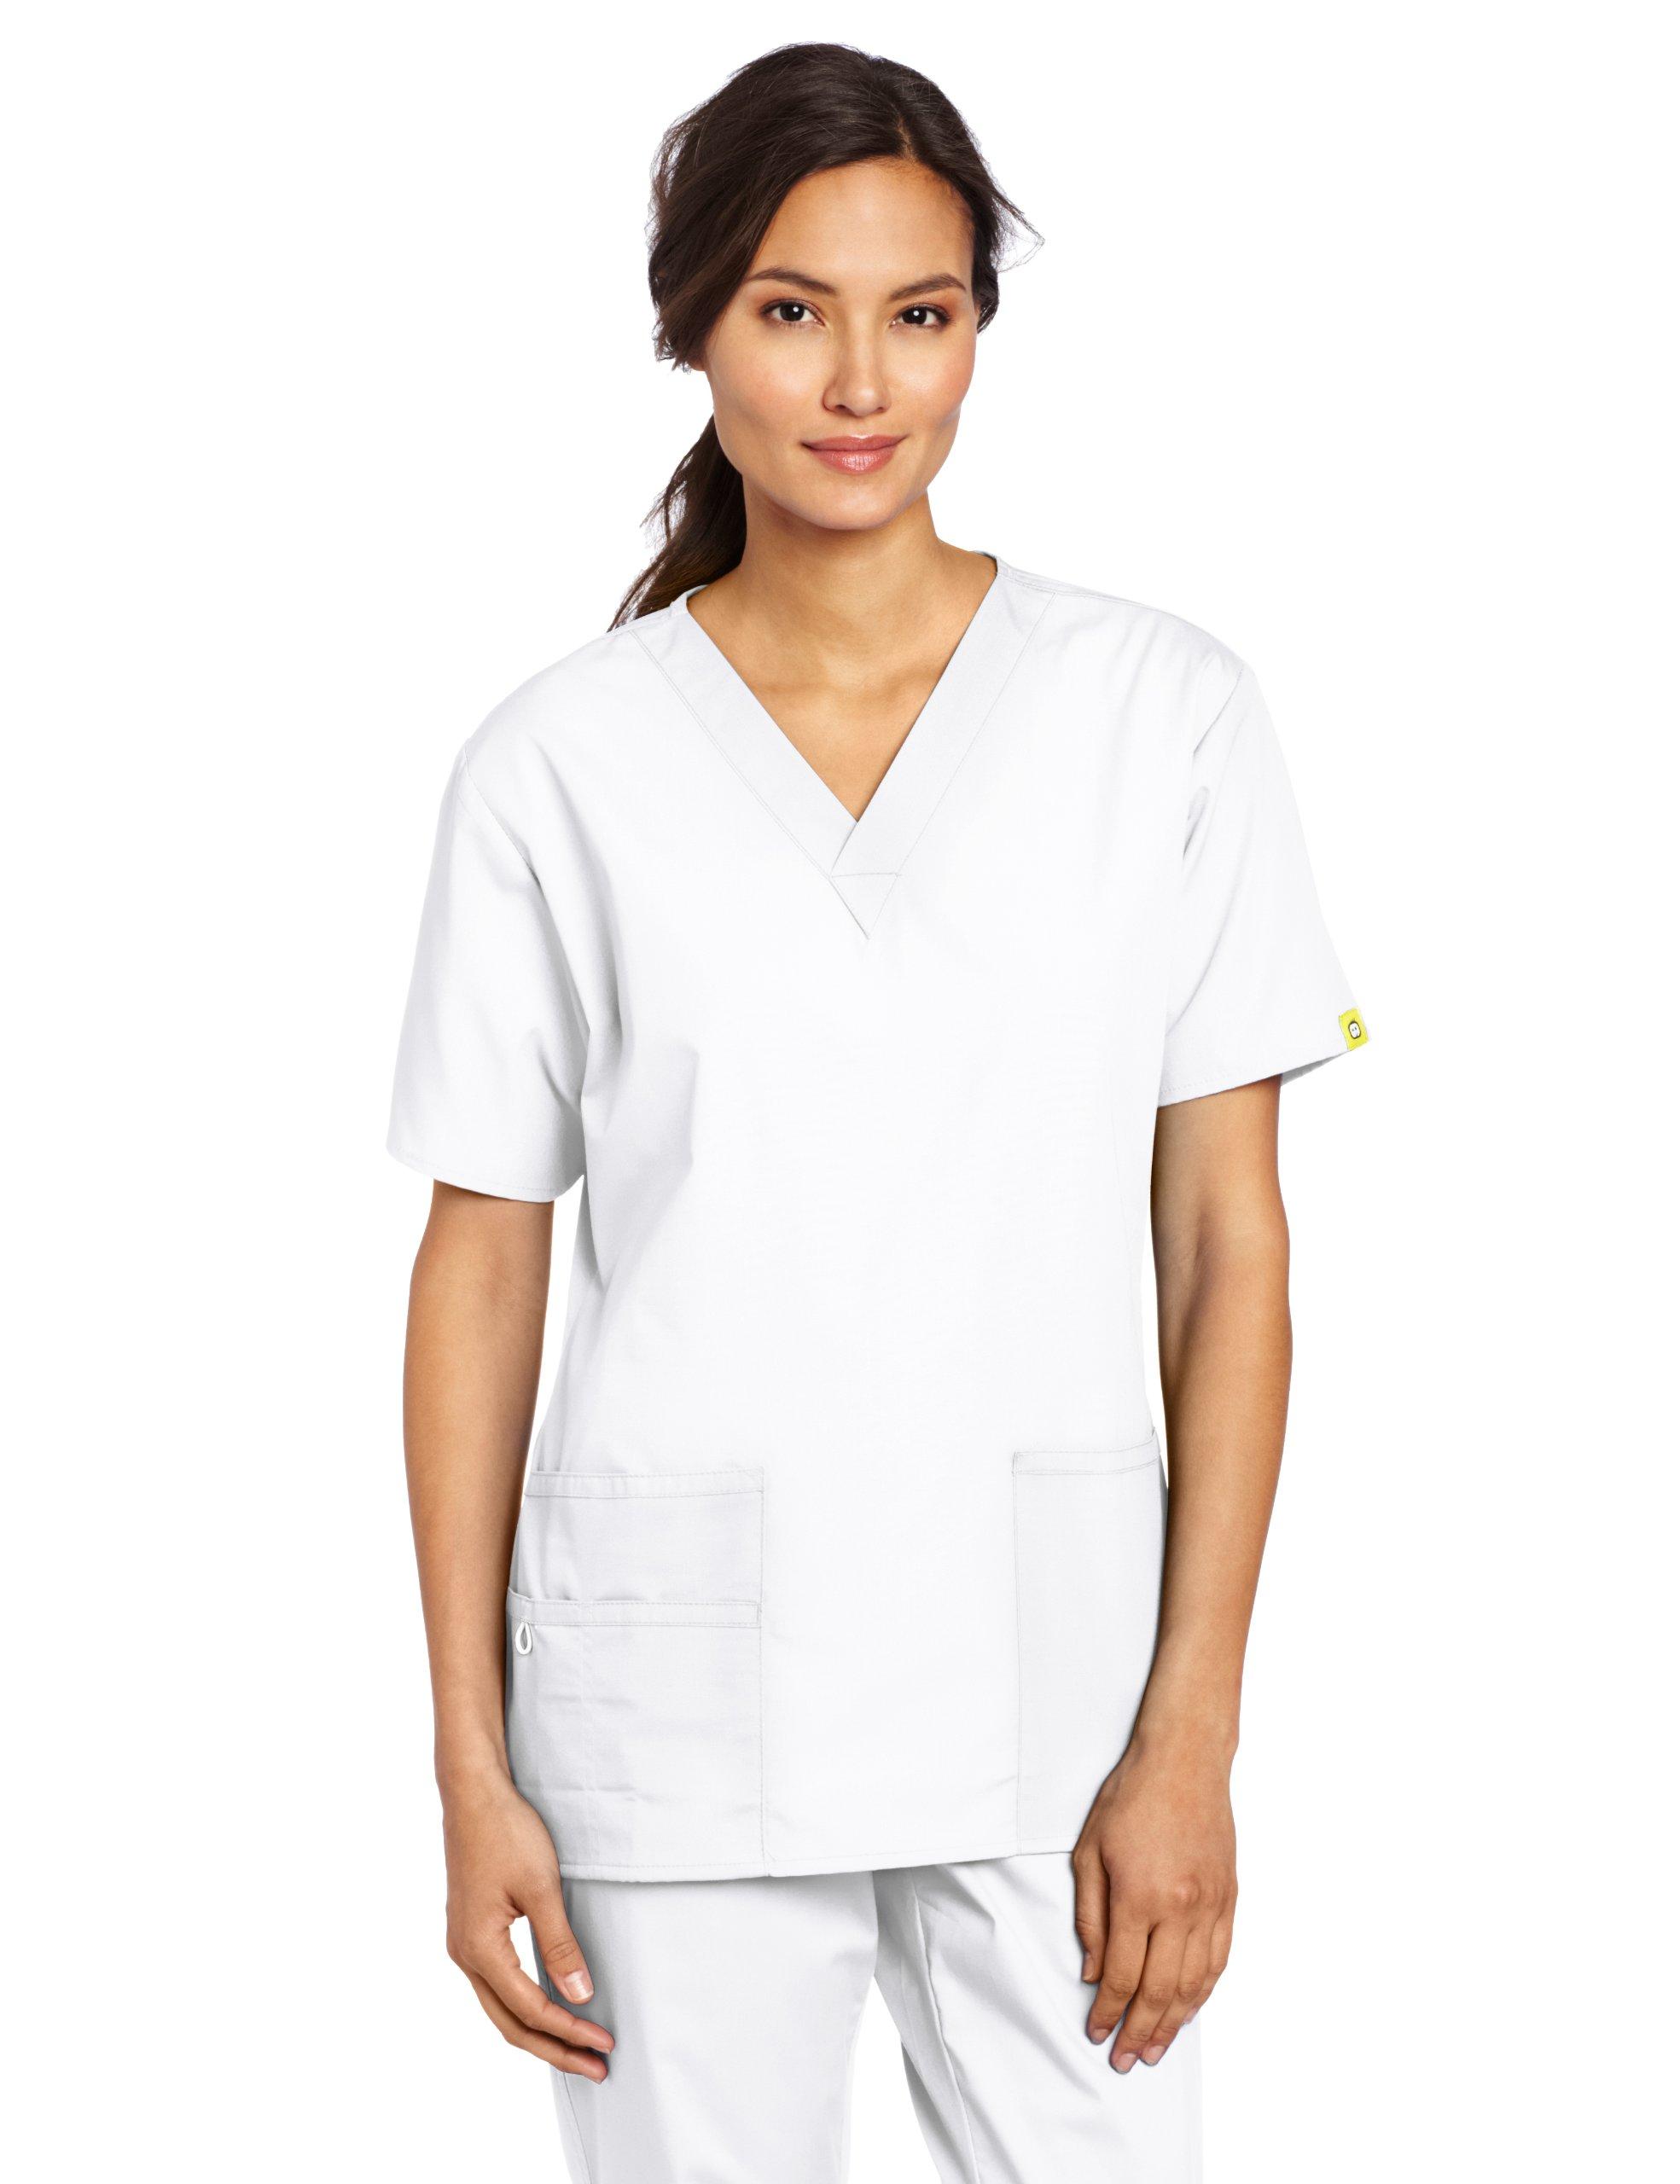 WonderWink Women's Scrubs Bravo 5 Pocket V-Neck Top, White, Small